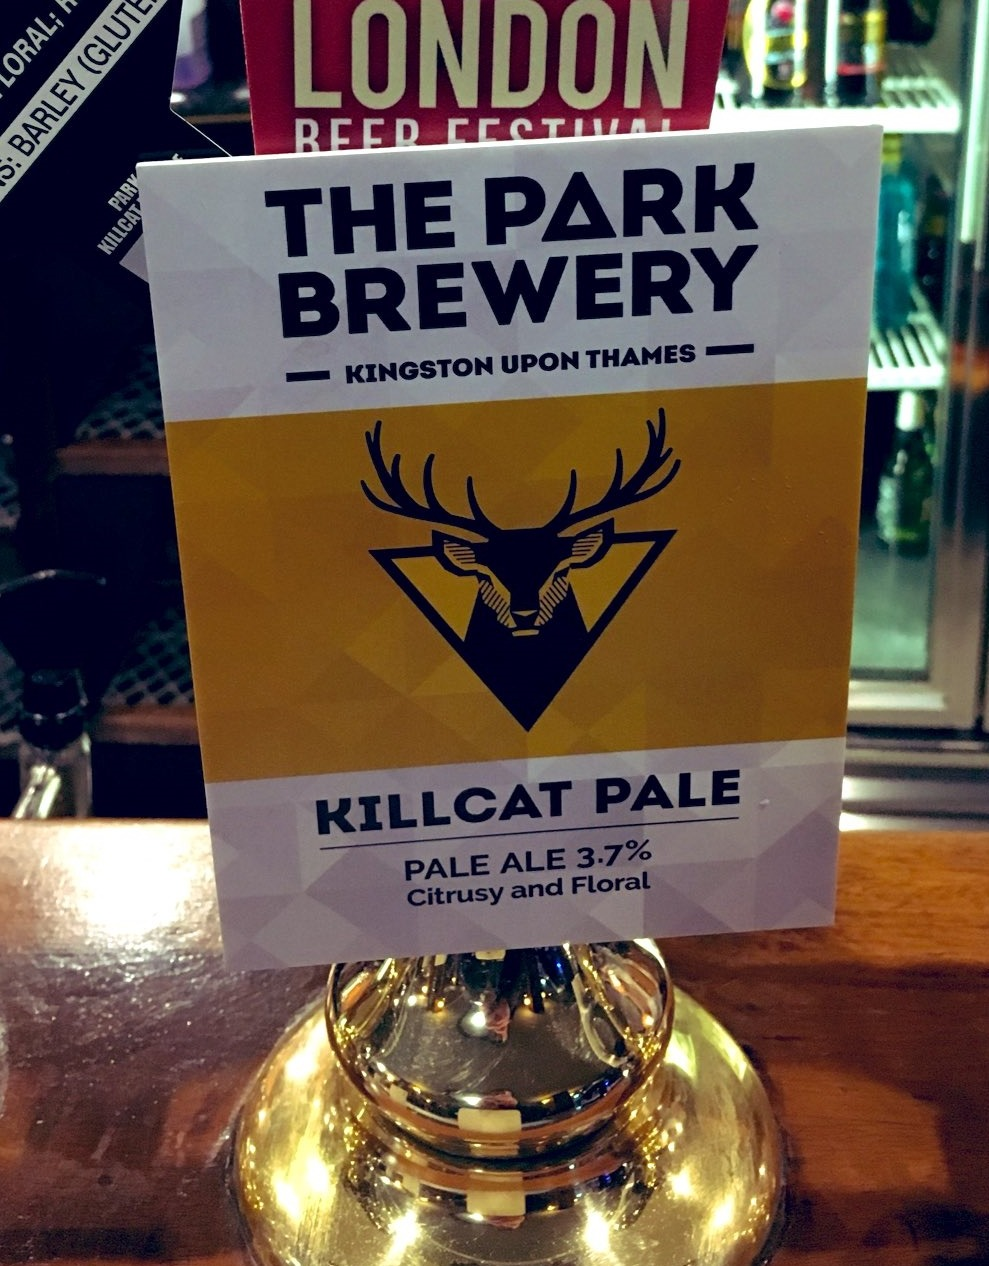 52: Killcat Pale